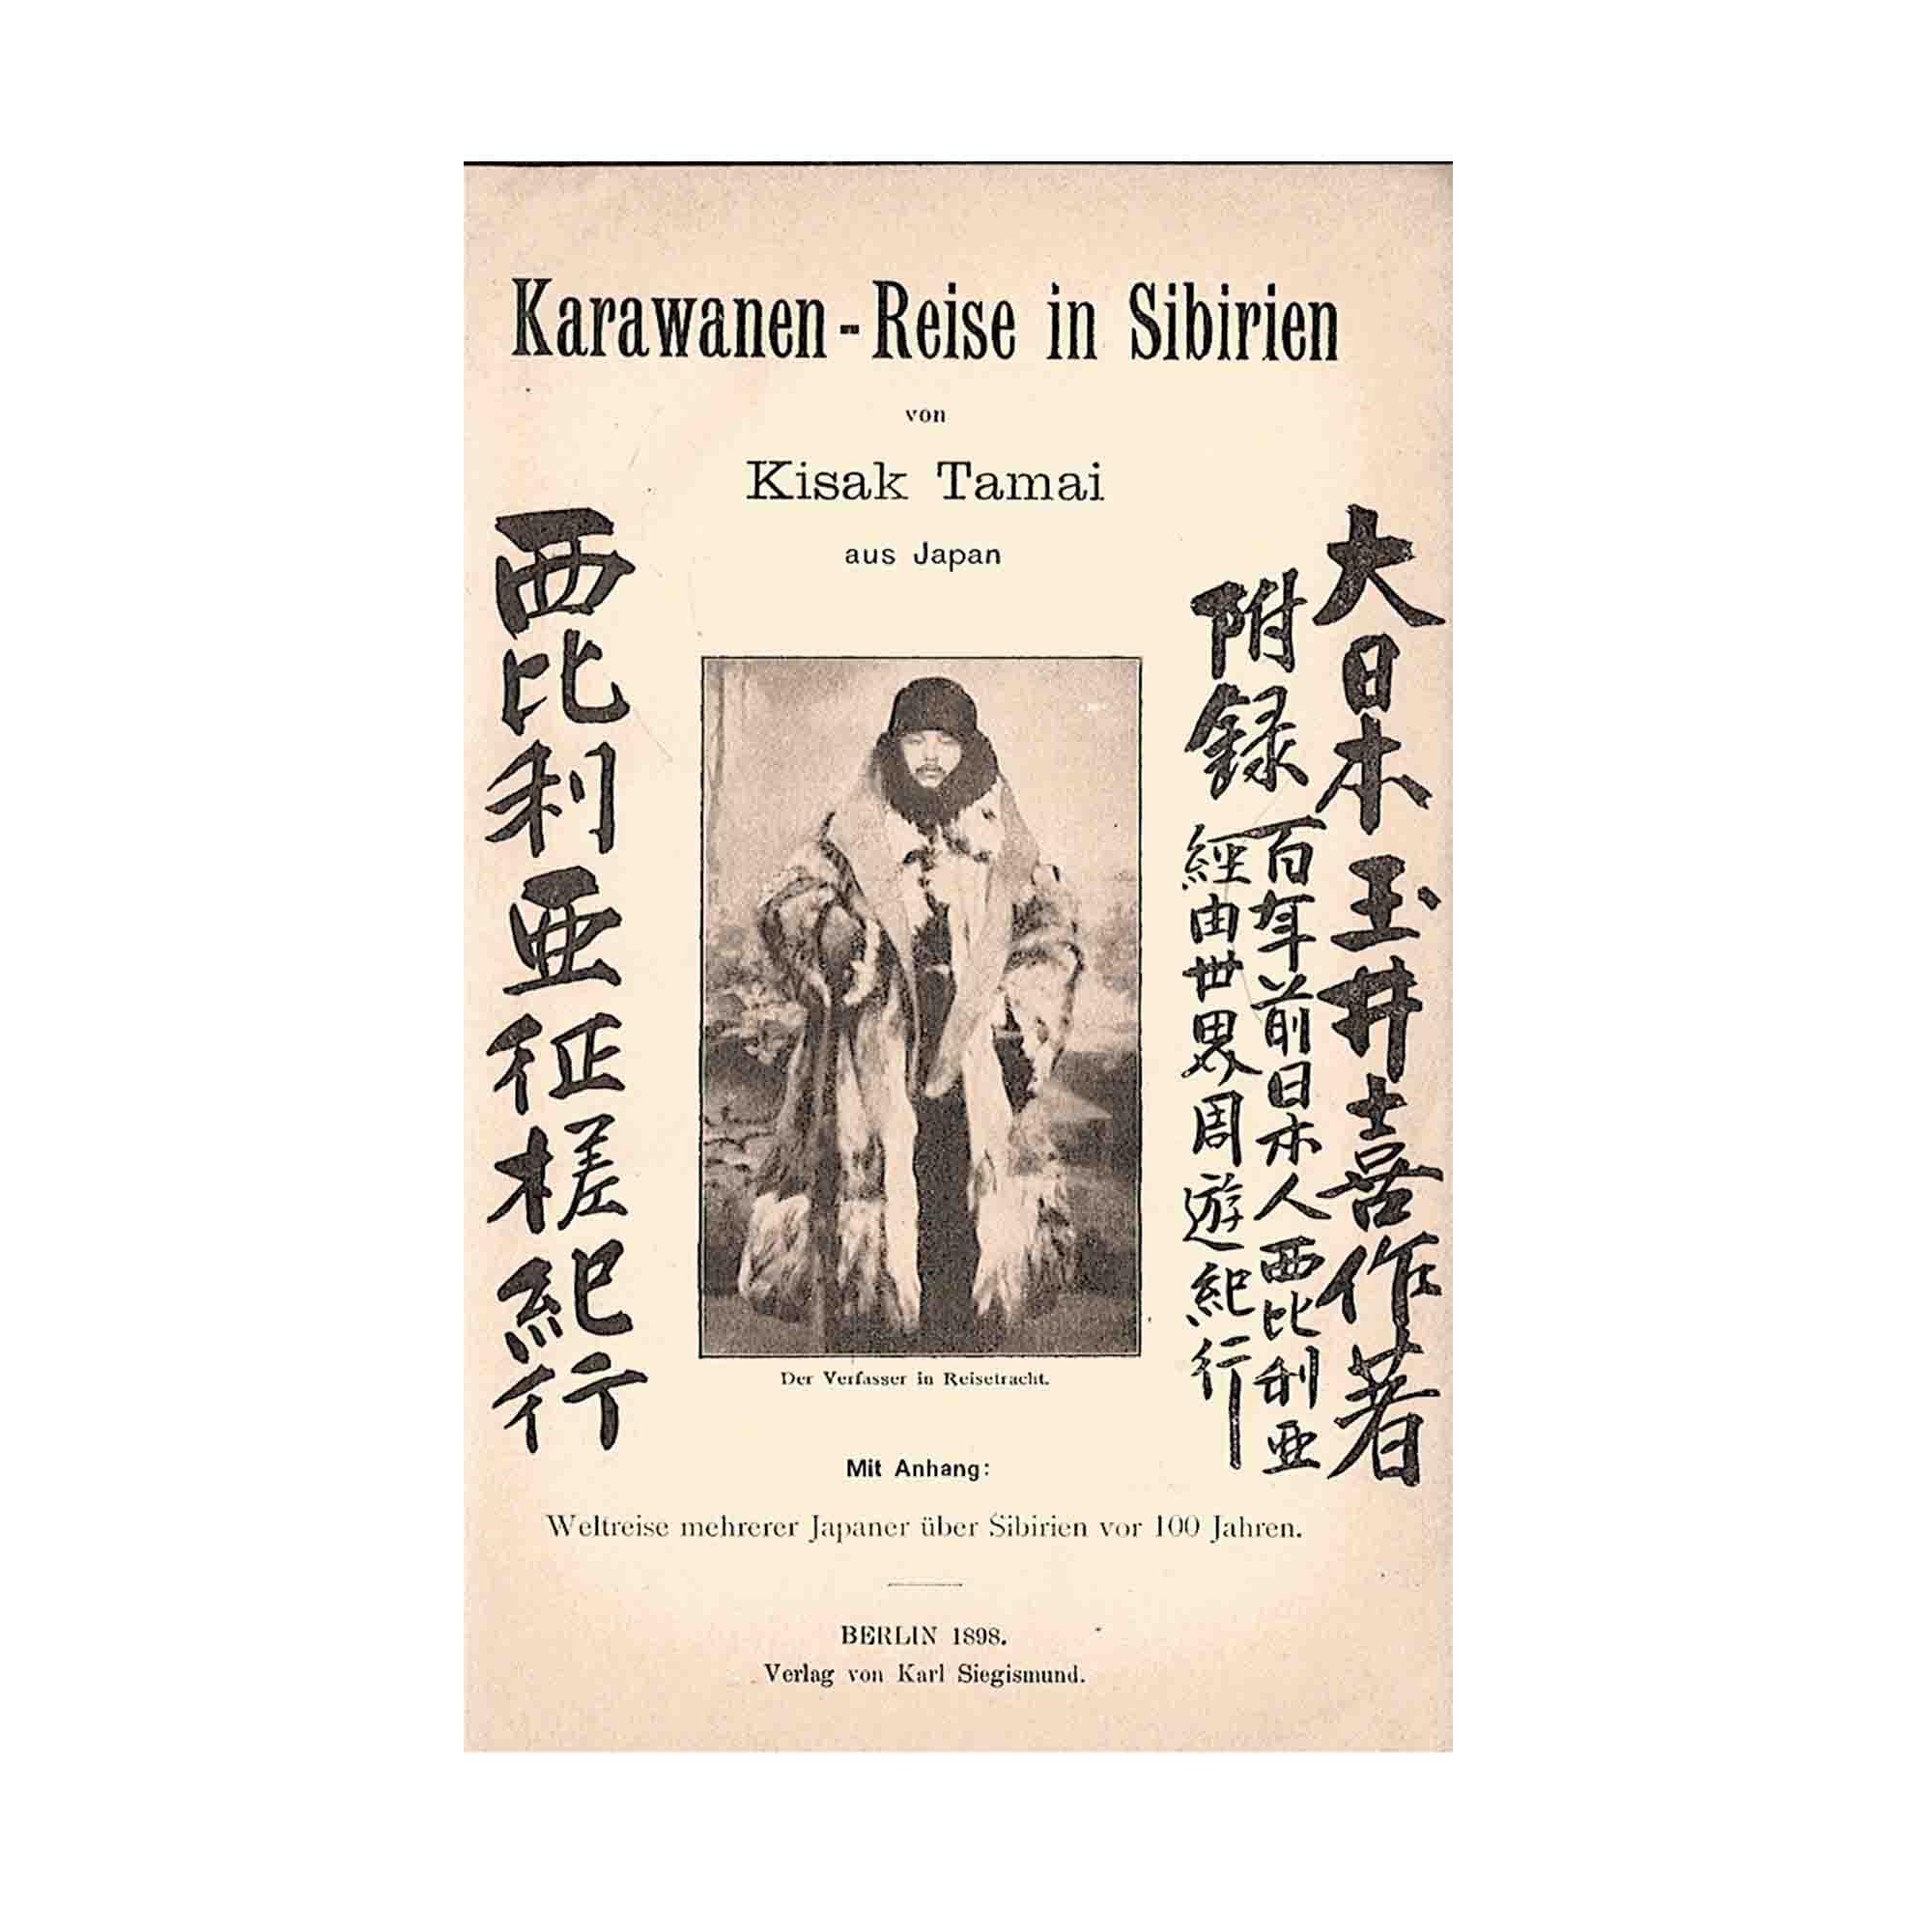 5461-Kisak-Tamai-Sibirien-1898-Titel-N.jpg